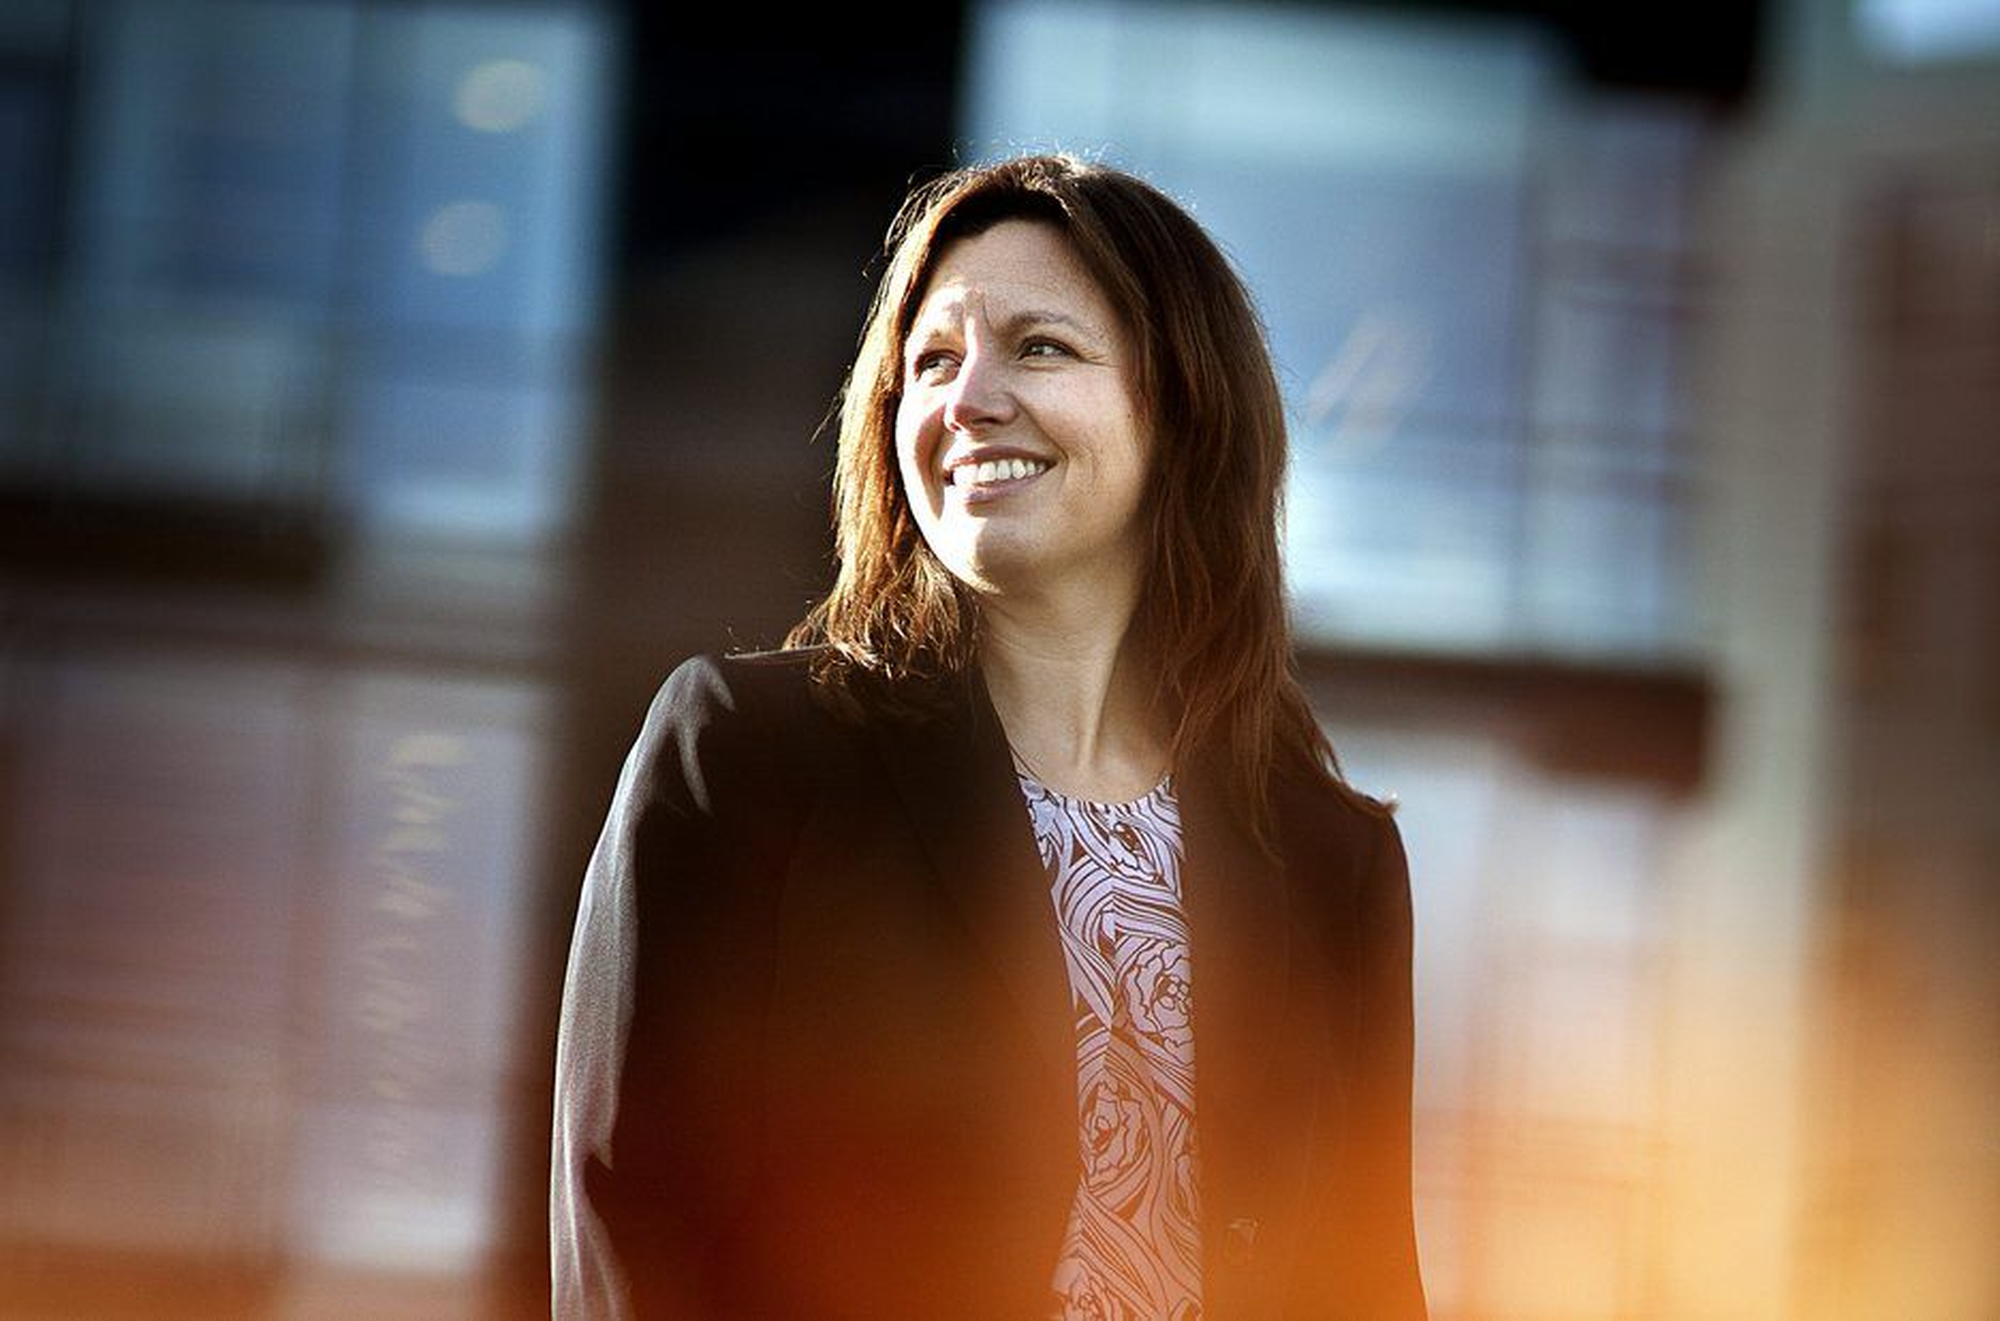 Det er morsomme tider i Aker Solutions, ifølge engineering-leder Astrid Skarheim Onsum.